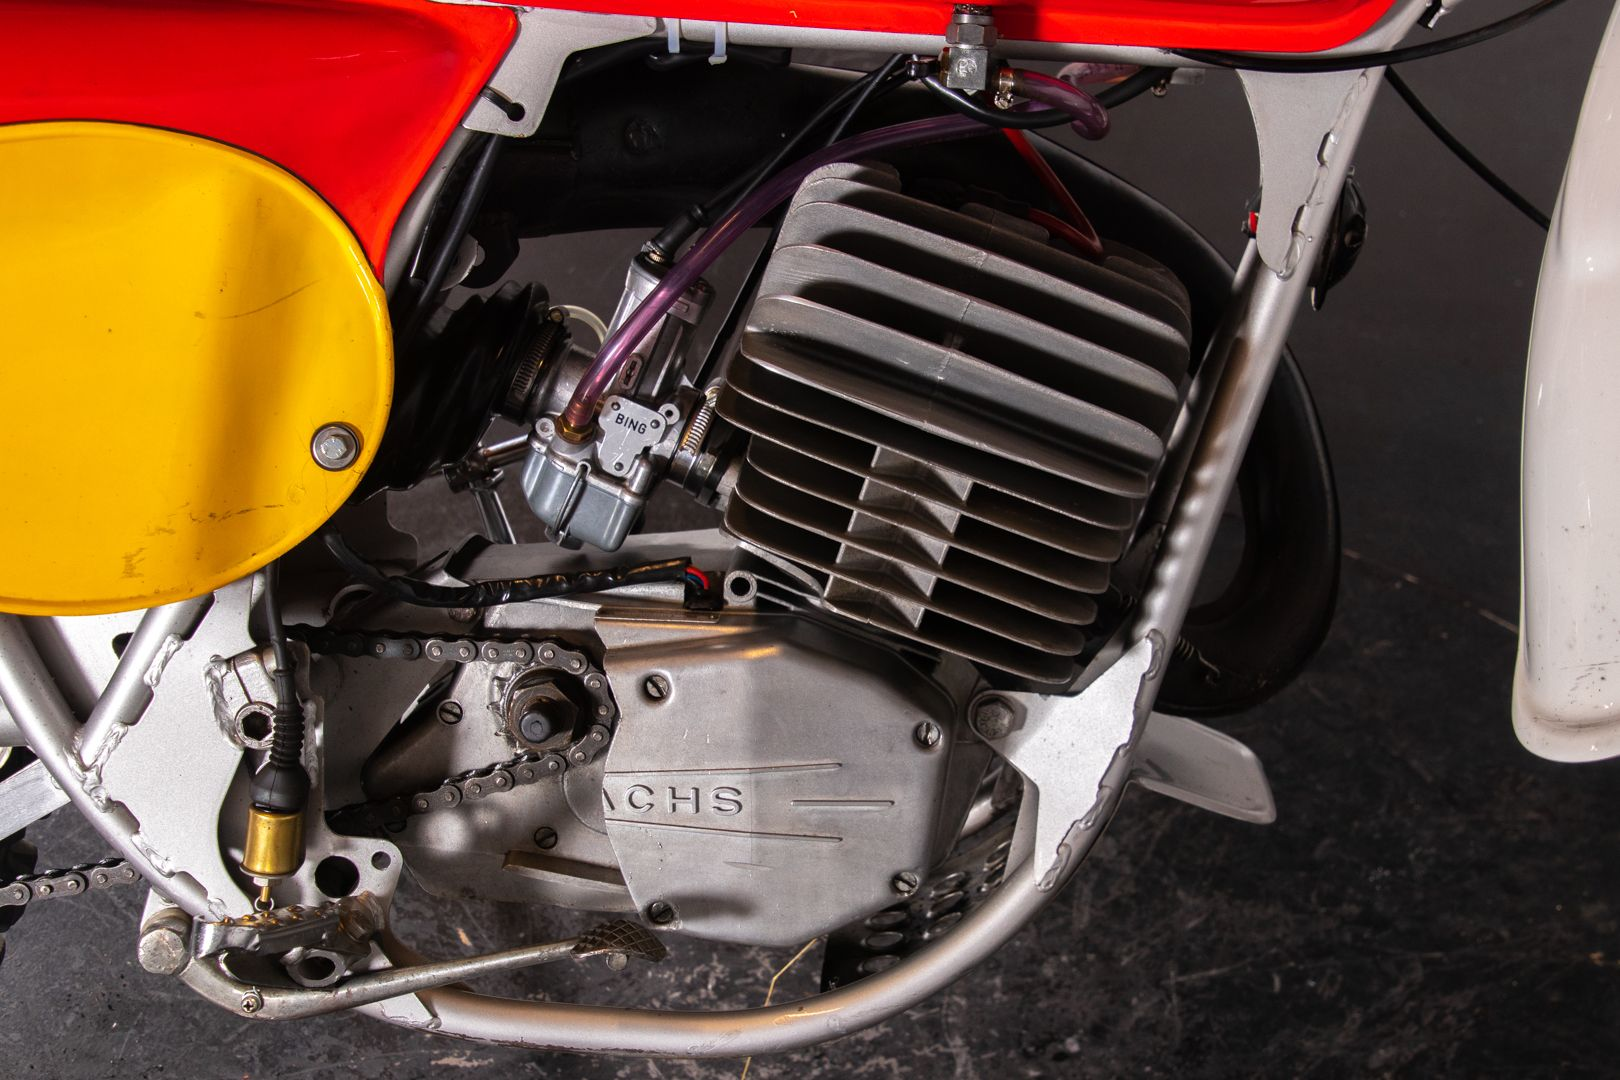 1974 KTM 125 GS 48760